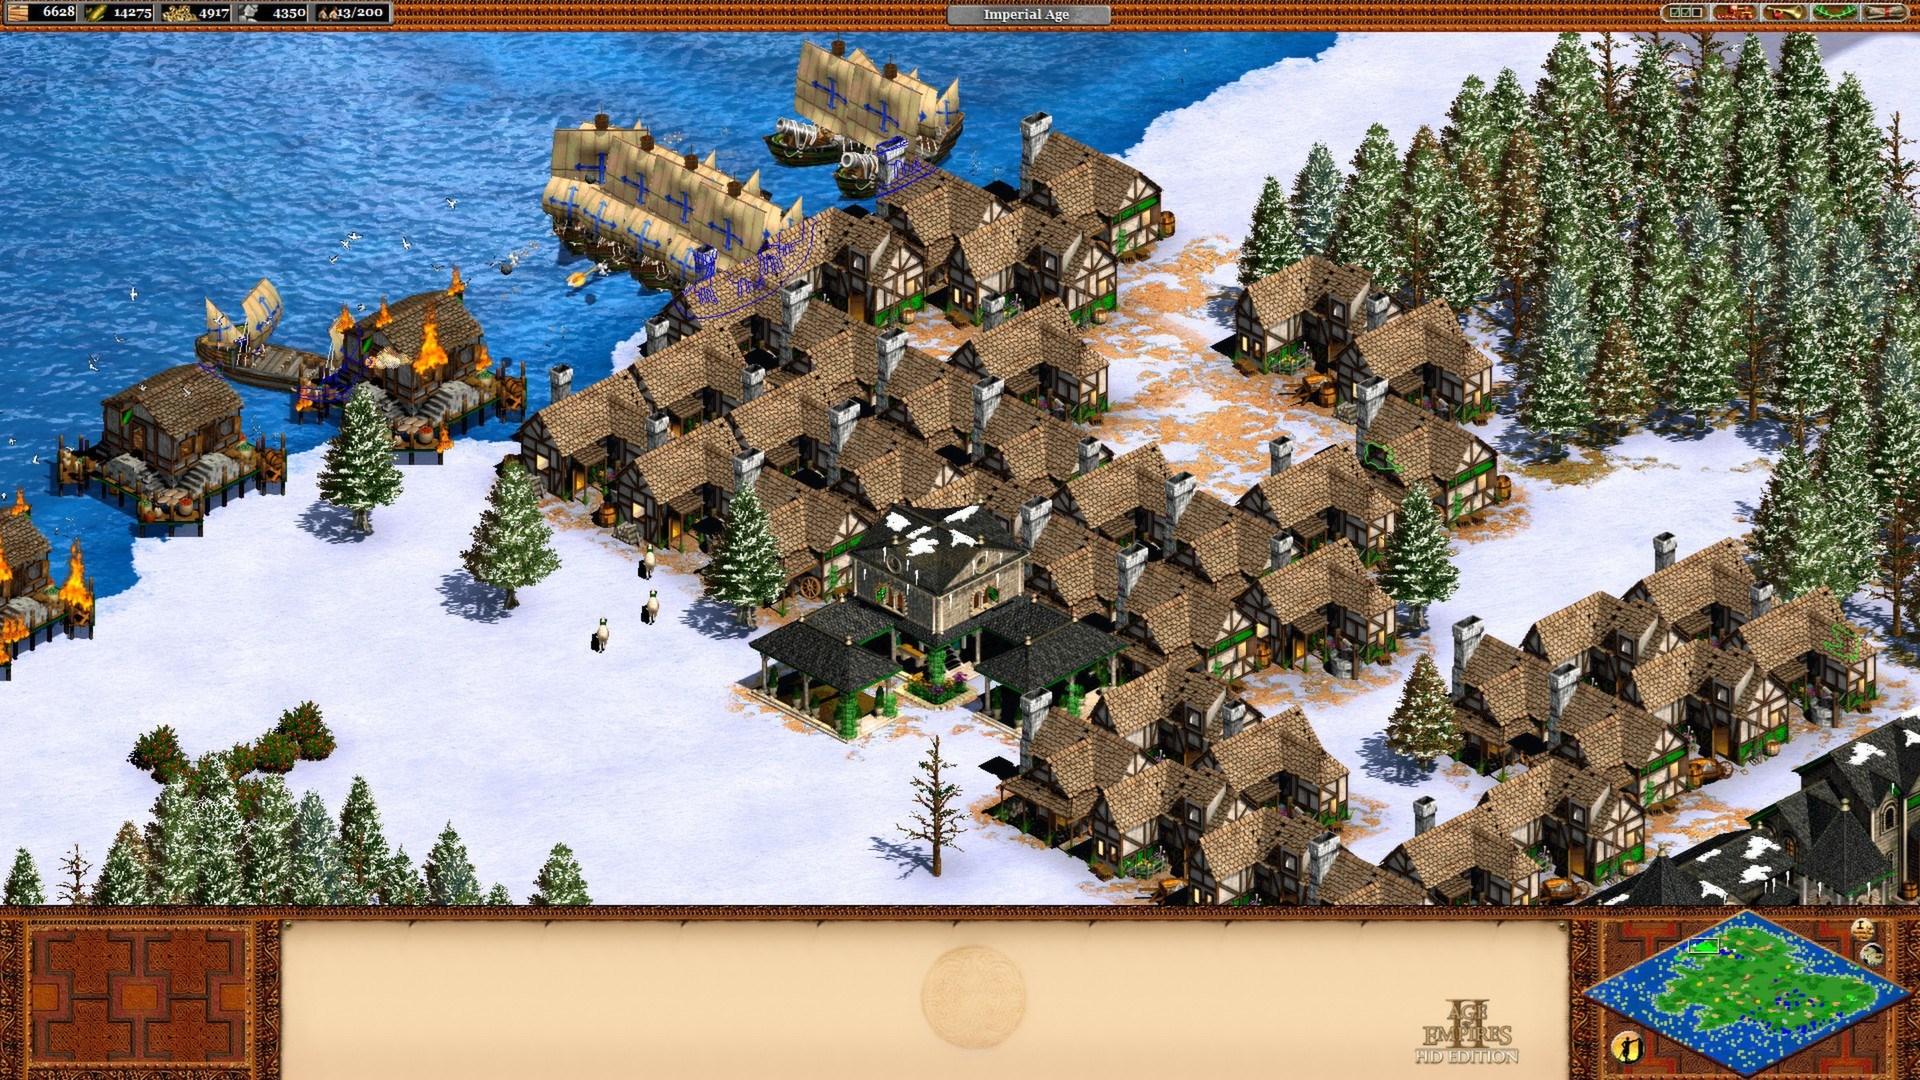 Age of Empires II HD Screenshot 3